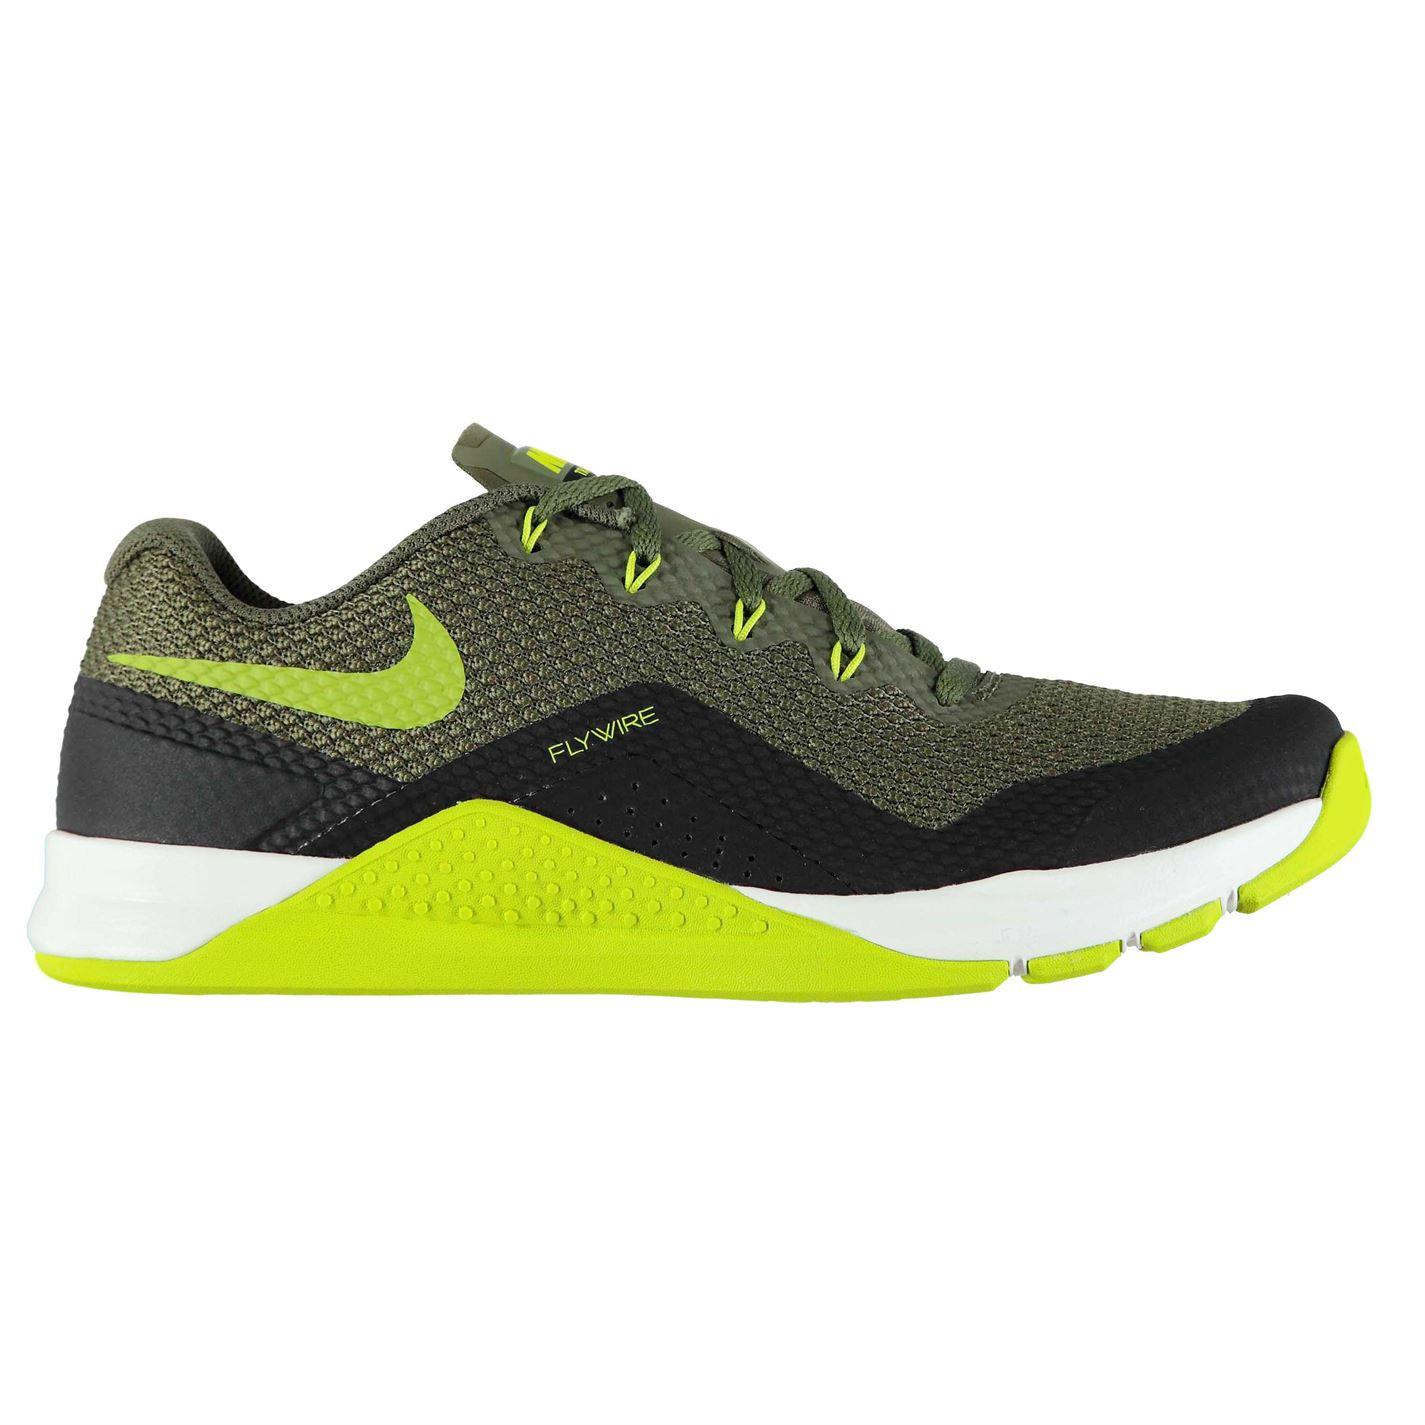 Nik Kokals Training Postmetro Celana Nike 01 Metcon Repper Dsx Shoes Mens Olive White Blk